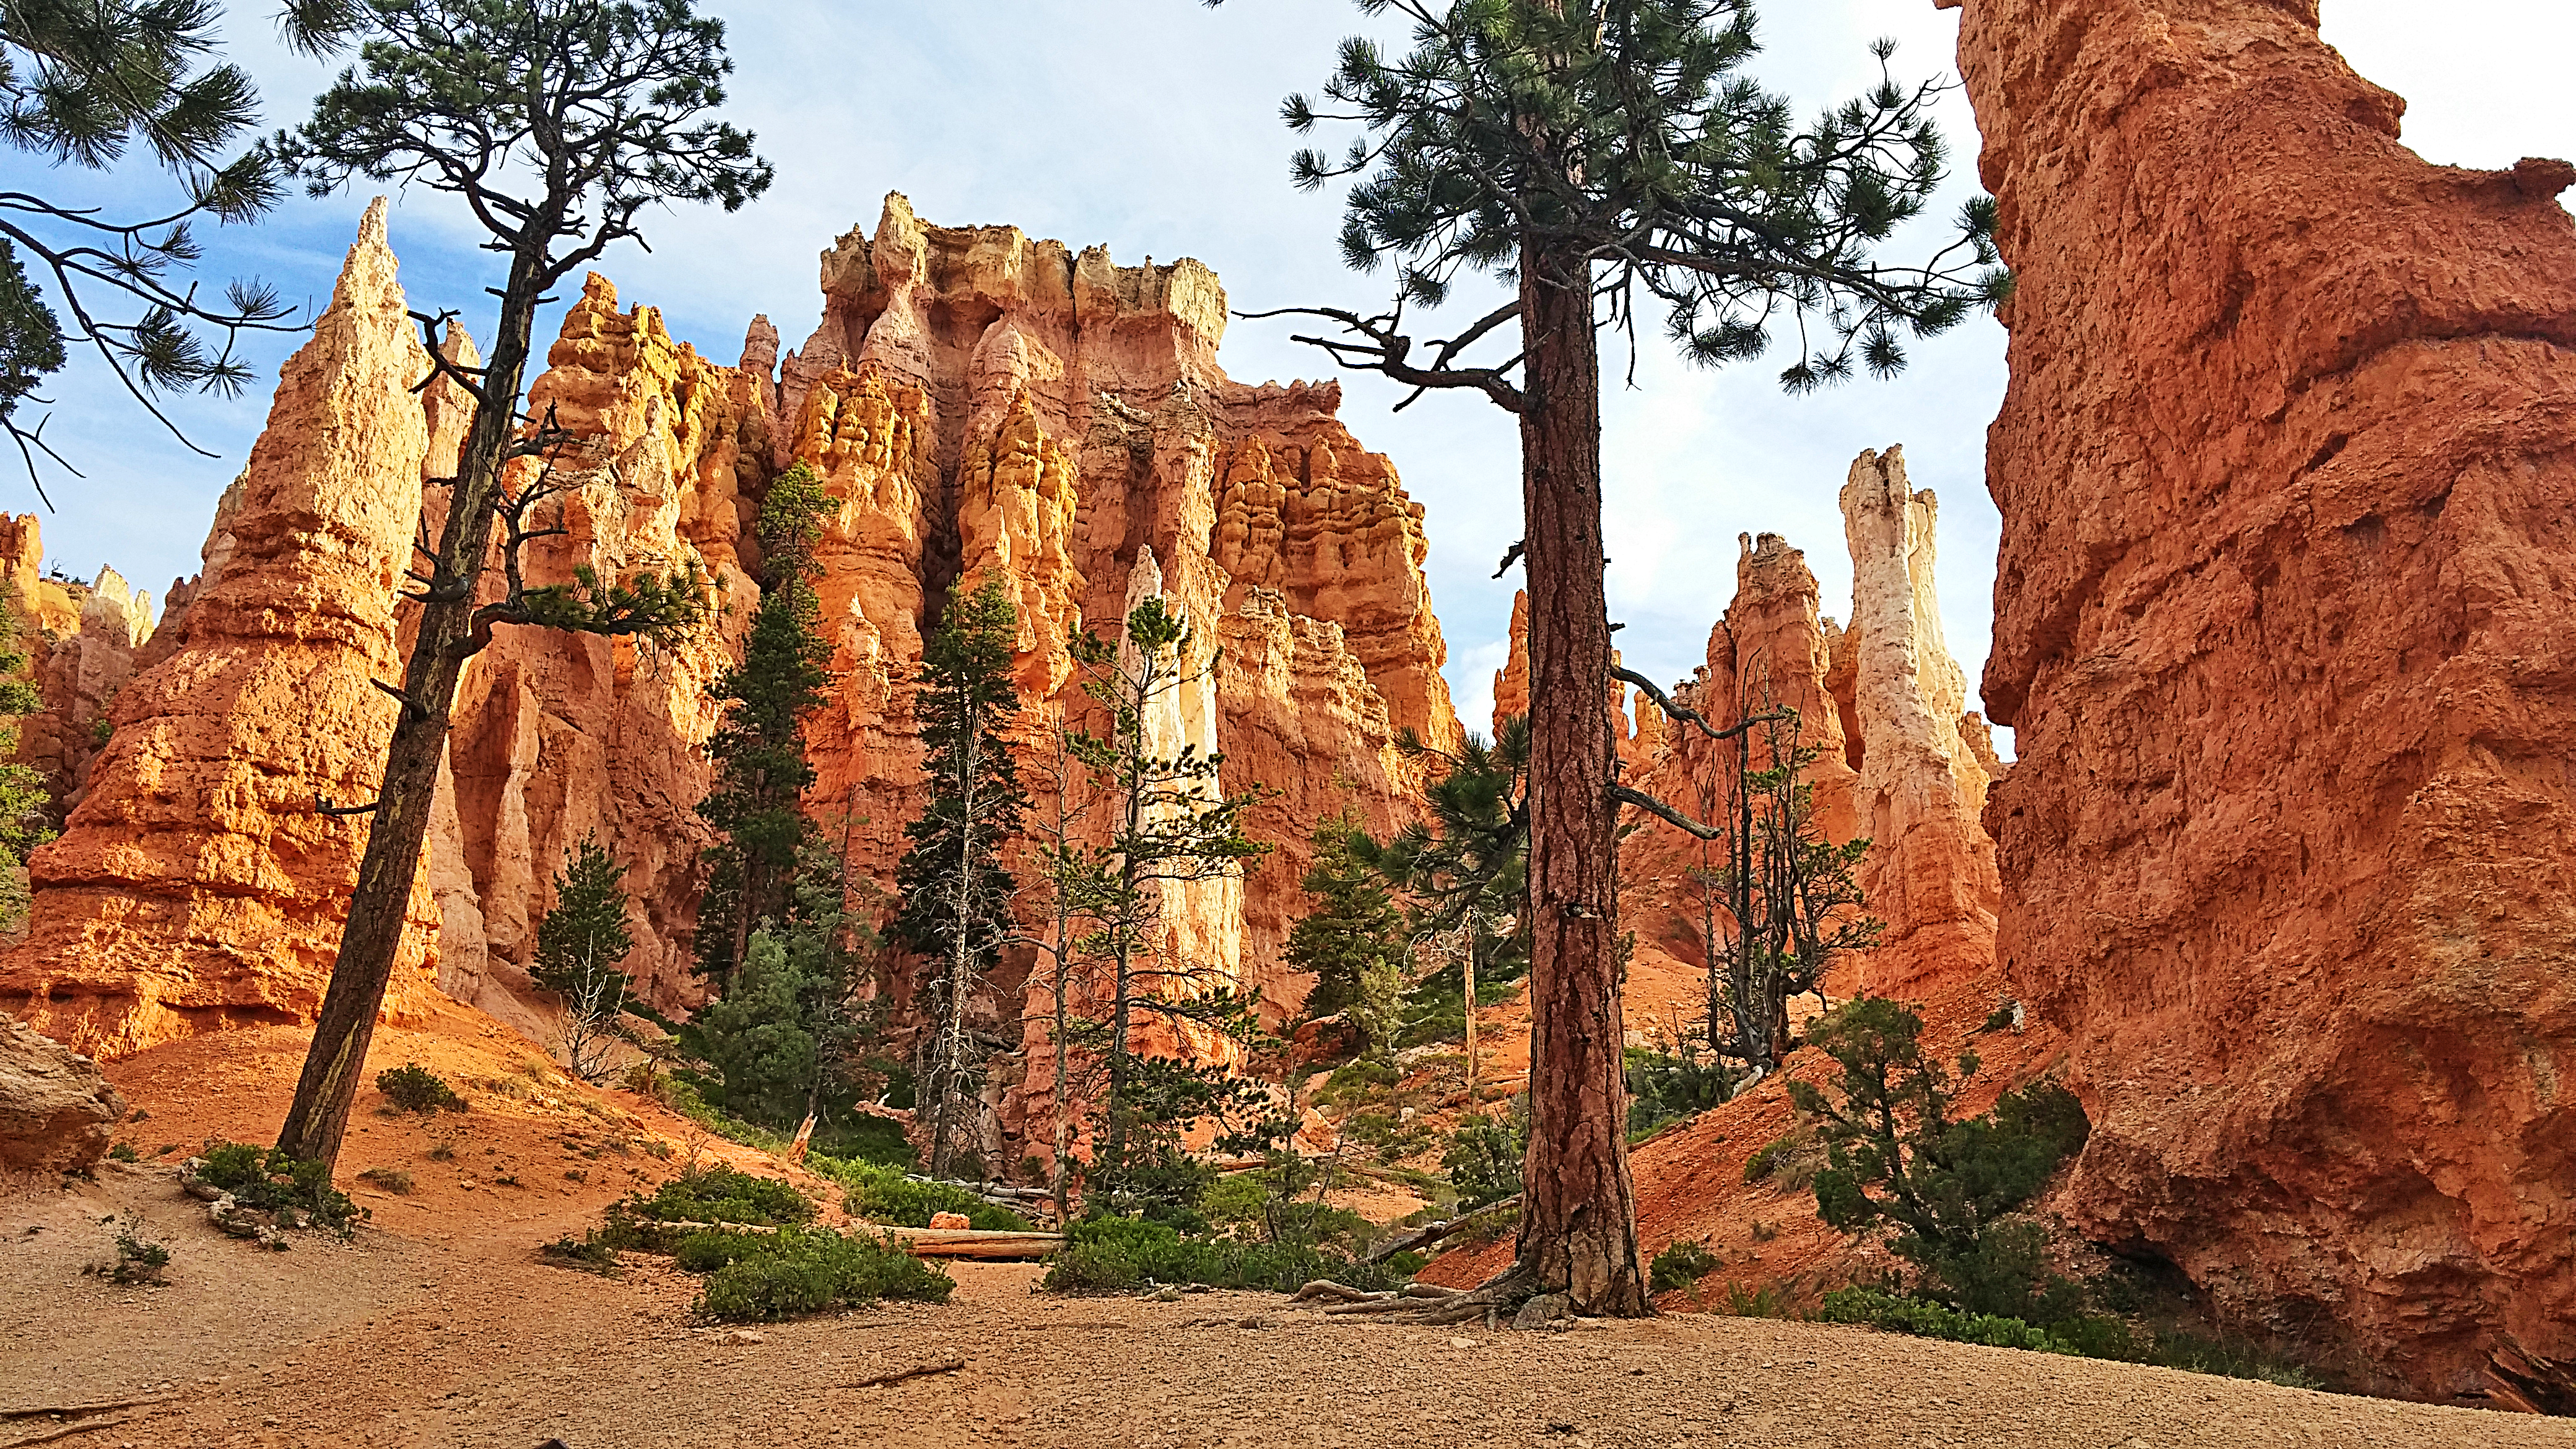 Bryce Canyon – Hiking the Hoodoos